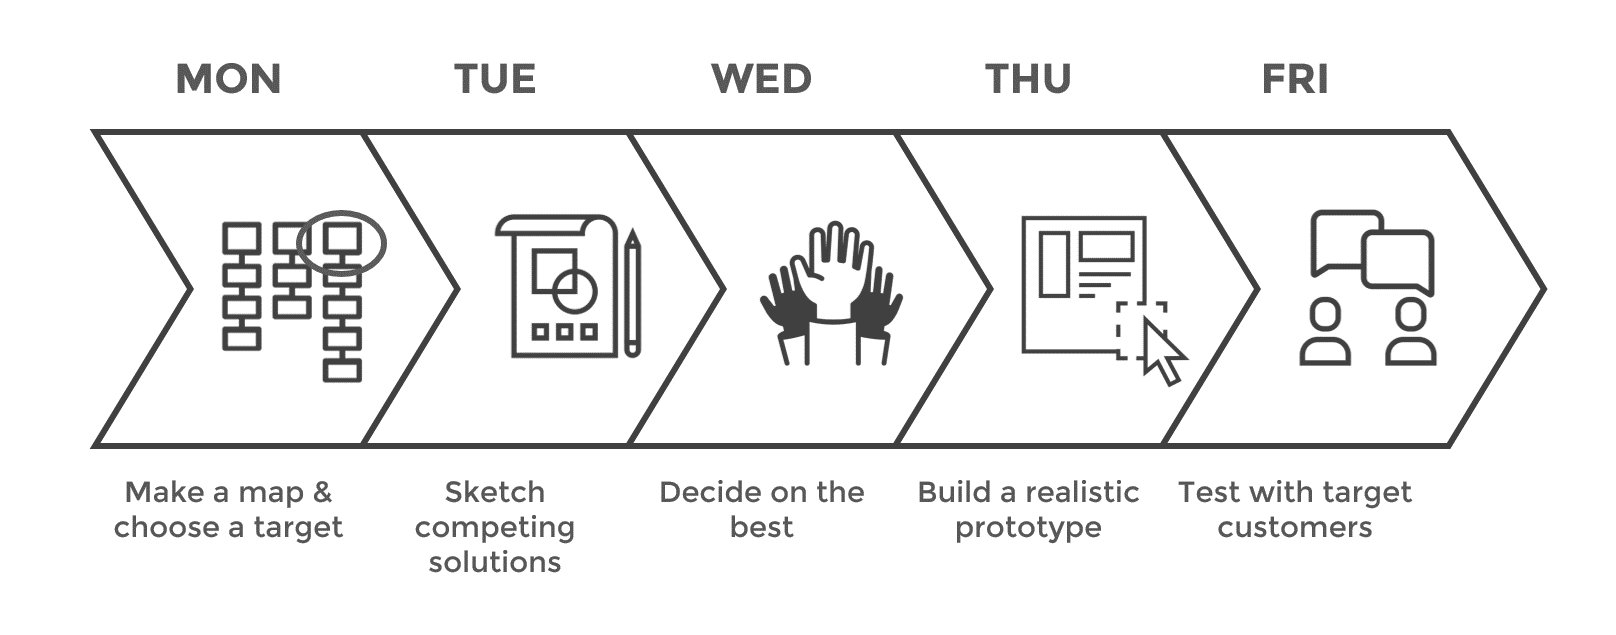 Google Ventures 5-day design sprint process